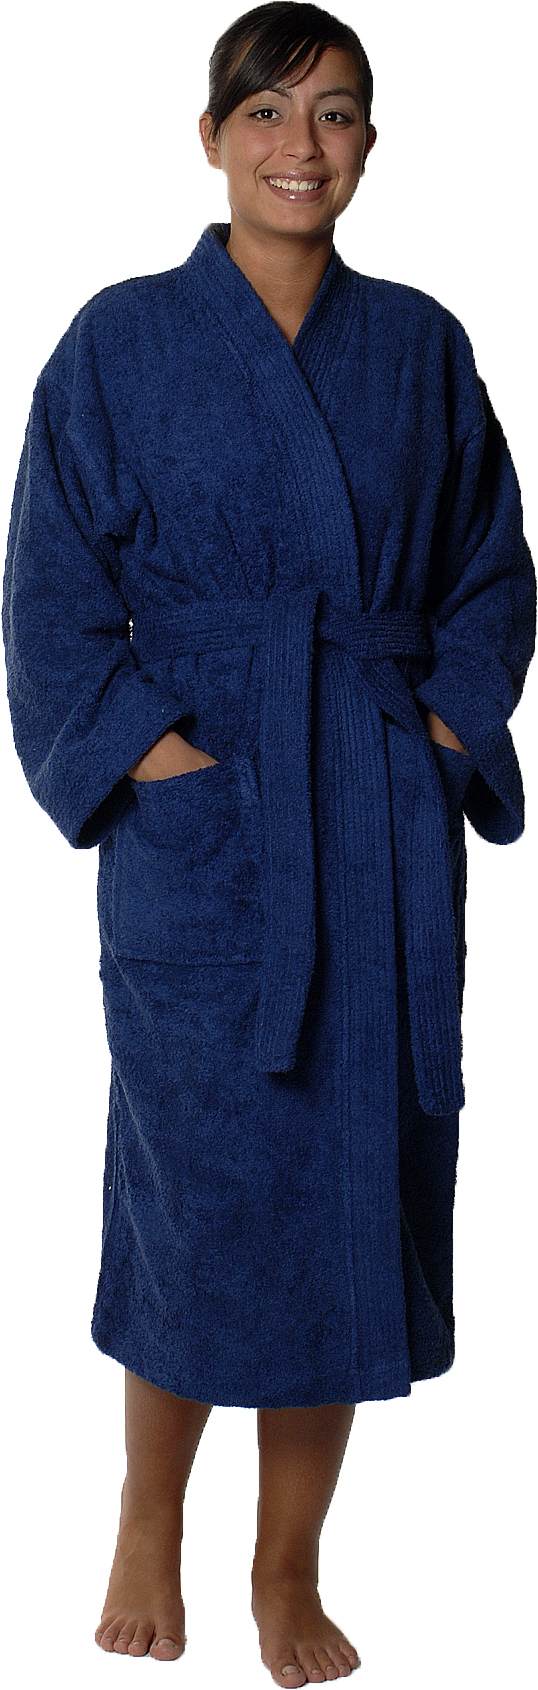 Peignoir col kimono en Coton couleur Marine Taille XL (Marine)